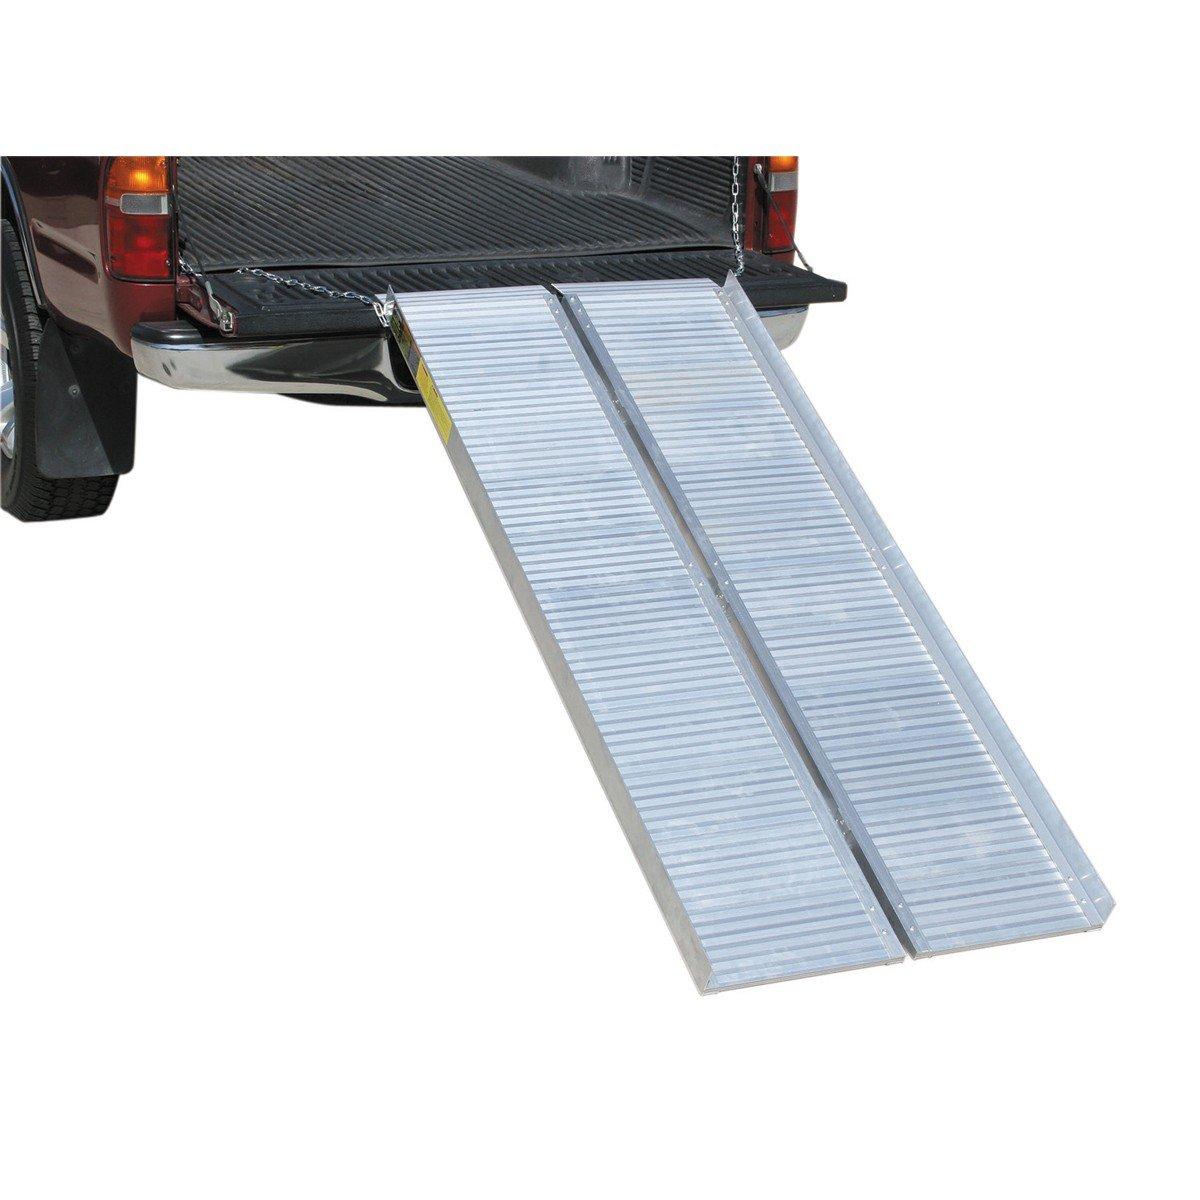 1/2 ton Capacity 30-1/4 in. x 72 in. Convertible Aluminum Loading Ramp HFJ14